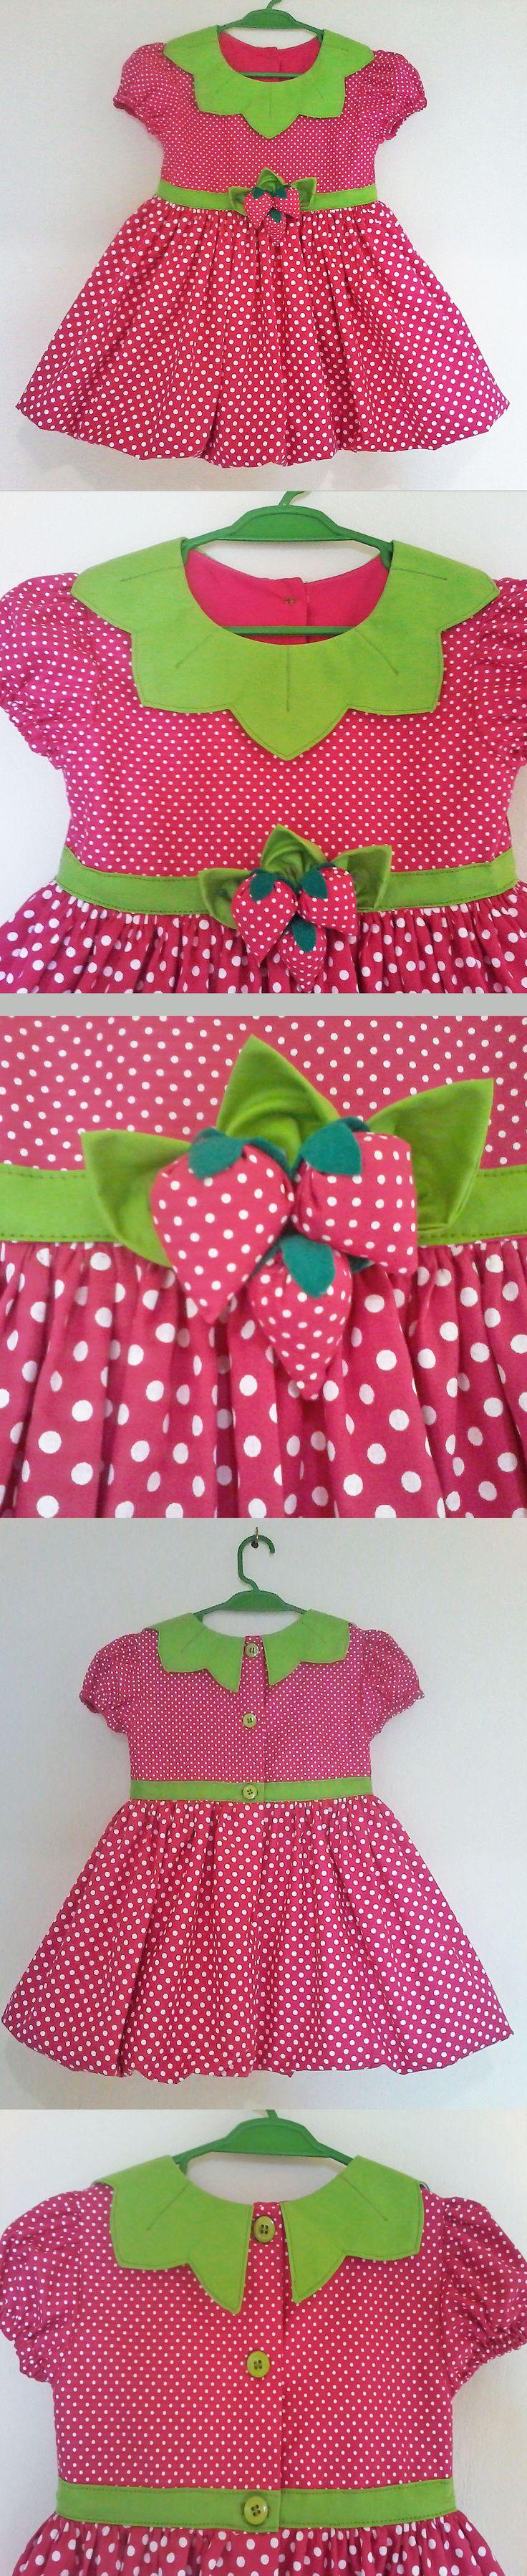 Vestido Moranguinho-- -- Strawberry Shortcake Dress -- --  baby - infant - toddler - kids - clothes for girls - Moldes Gratuitos - Free Patterns  -----------------------------------------------------Molde grátis  em https://www.facebook.com/groups/1594730384185604/